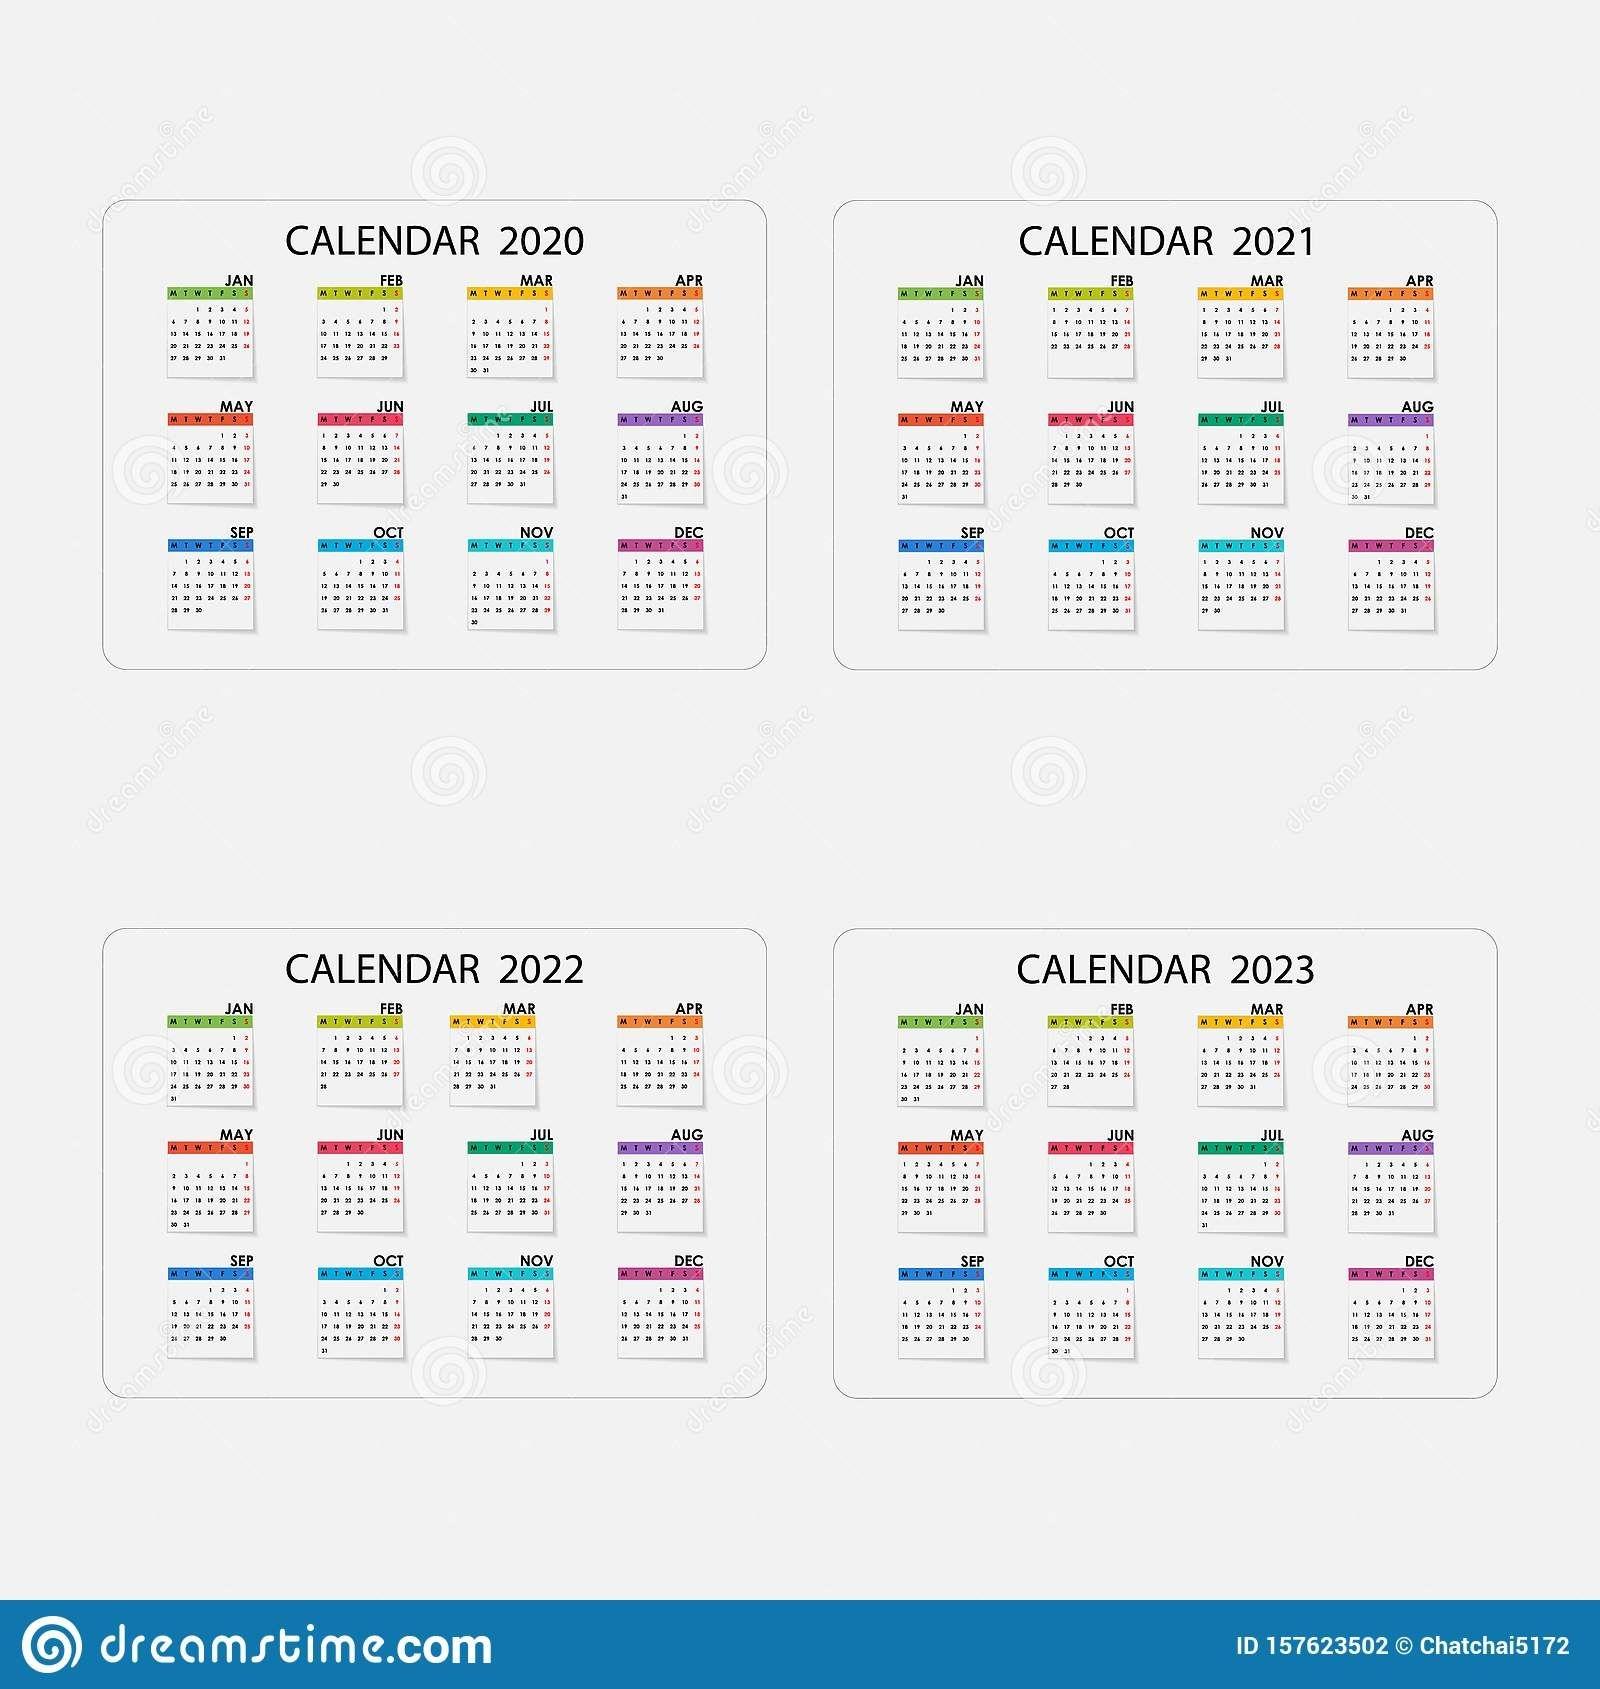 Calendar 2020, 2021,2022 And 2023 Calendar Template